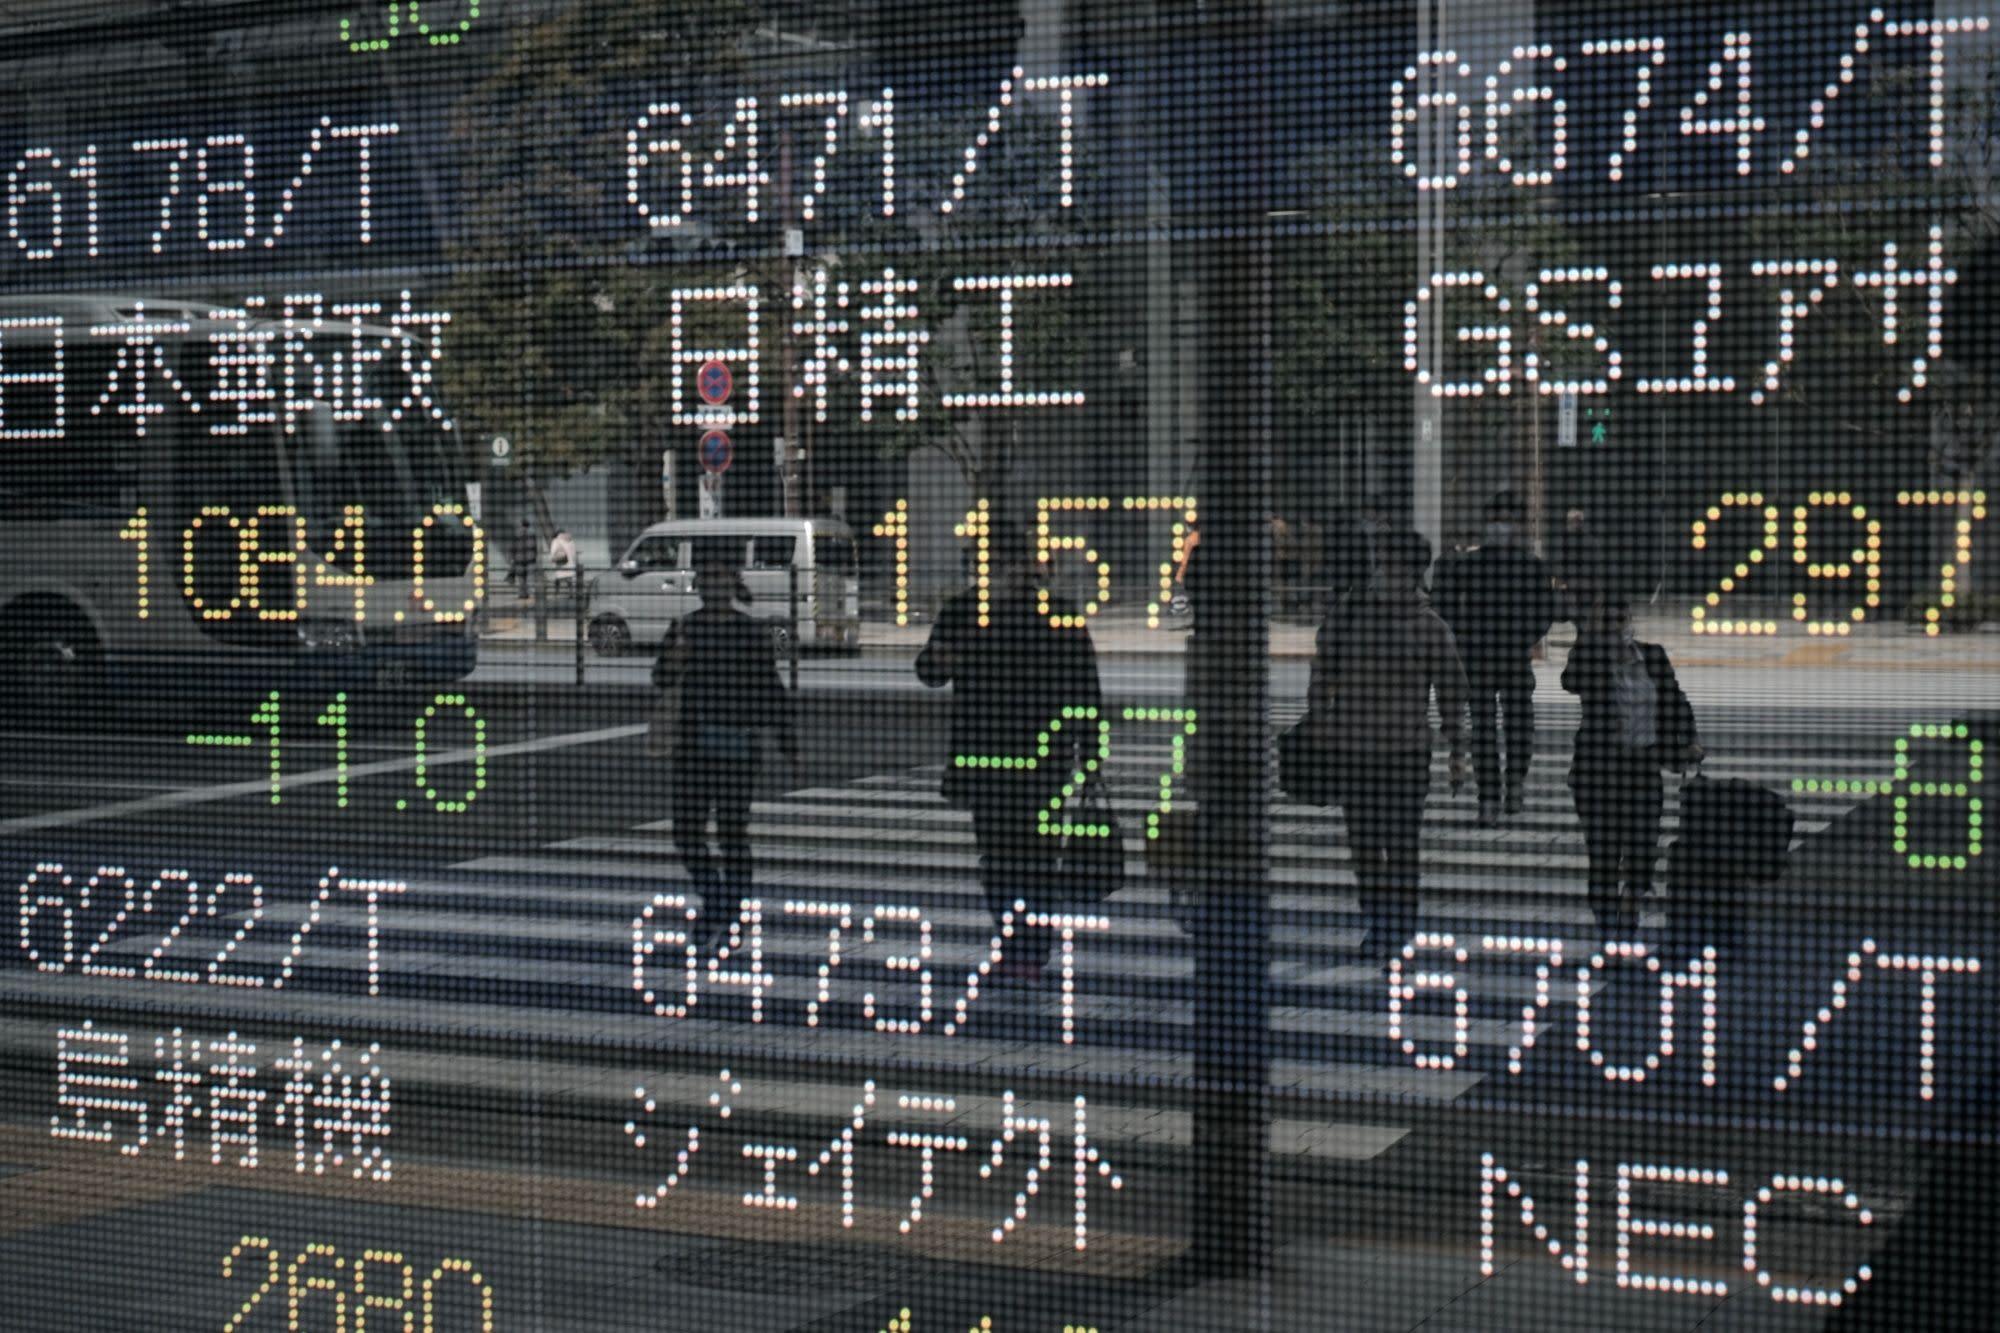 Stocks, Futures Drop Amid Spike in Treasury Yields: Markets Wrap